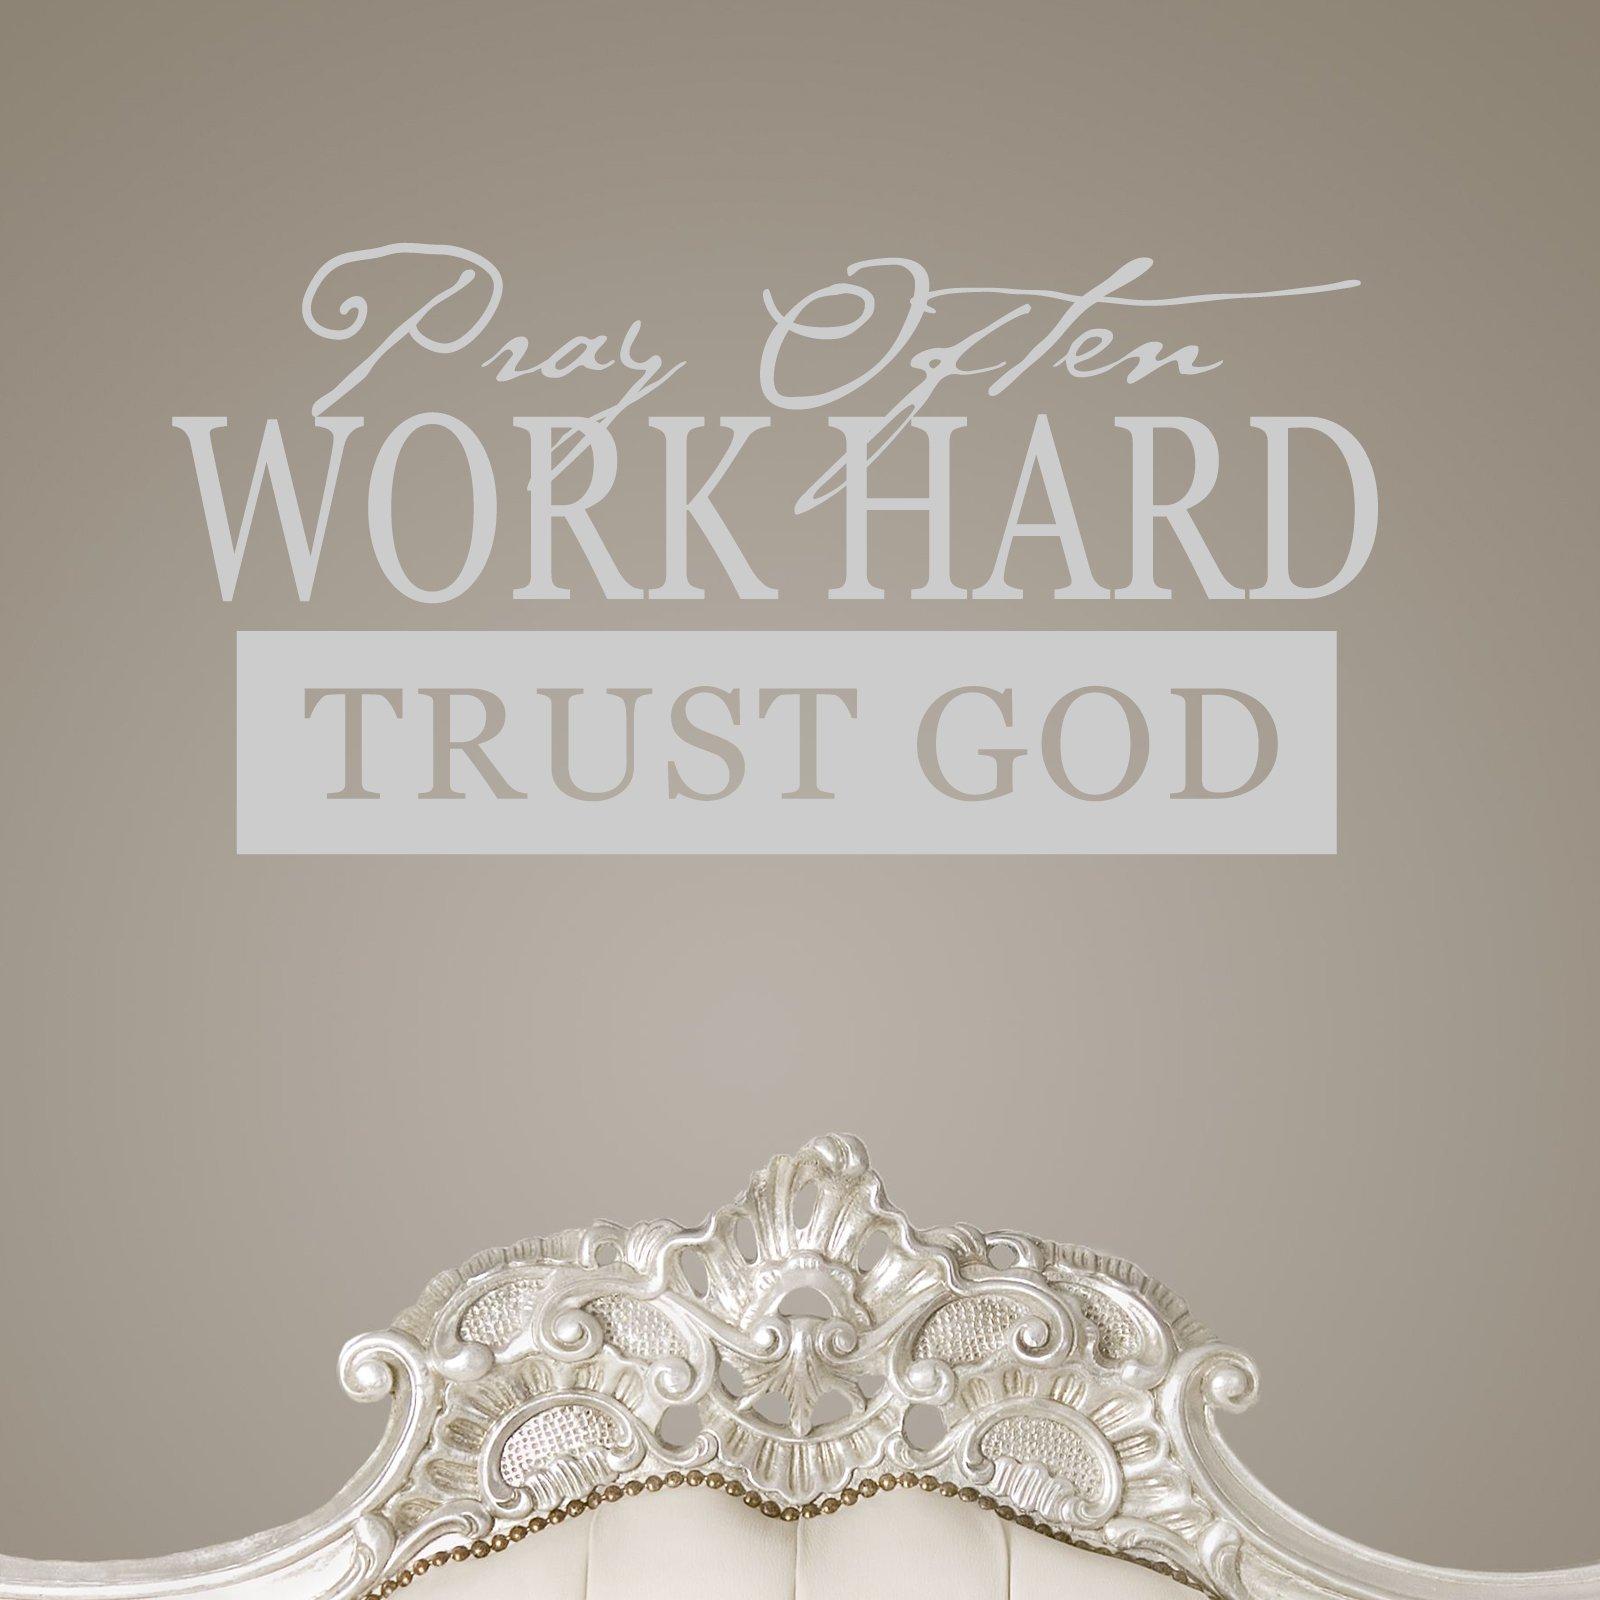 Chinese Symbols For Trust Pray Often Work Hard T...